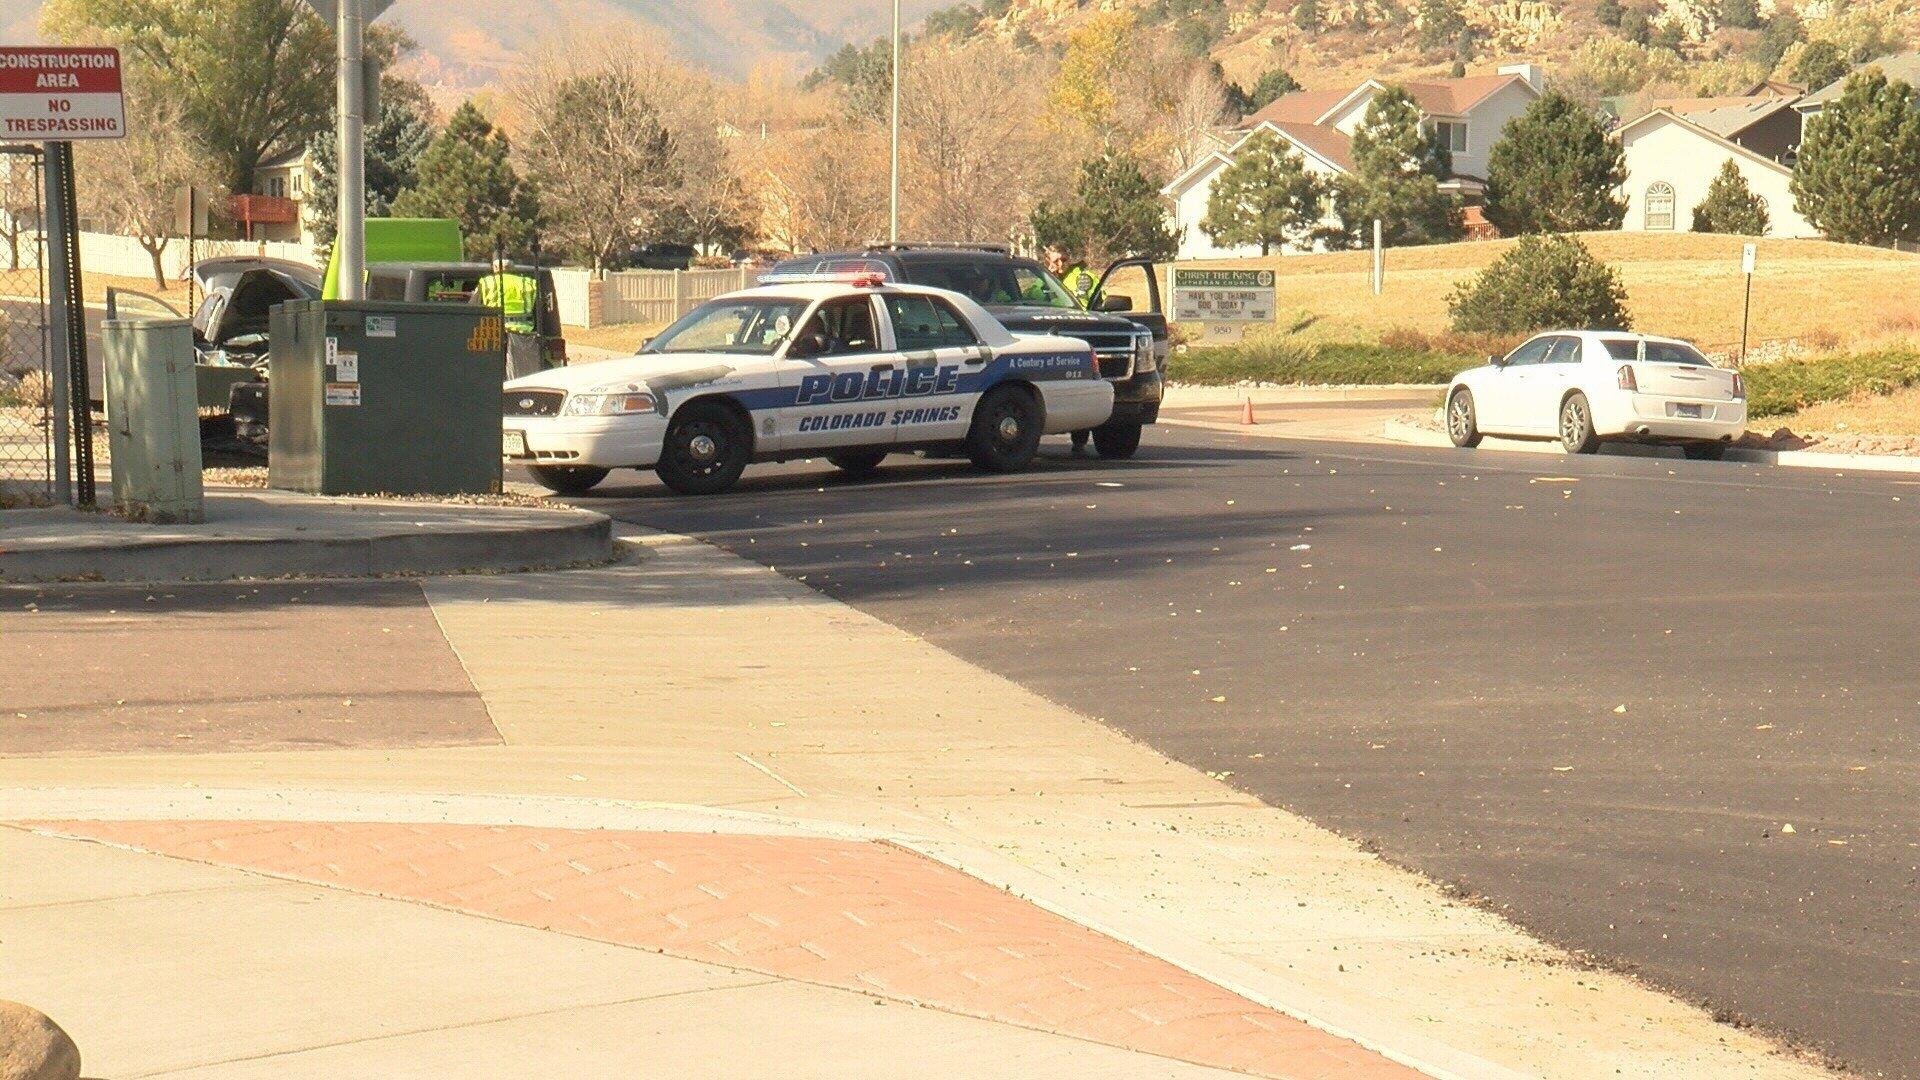 Colorado Springs PD investigates a fatal crash at Vindicator and Rockrimmon. (KOAA)